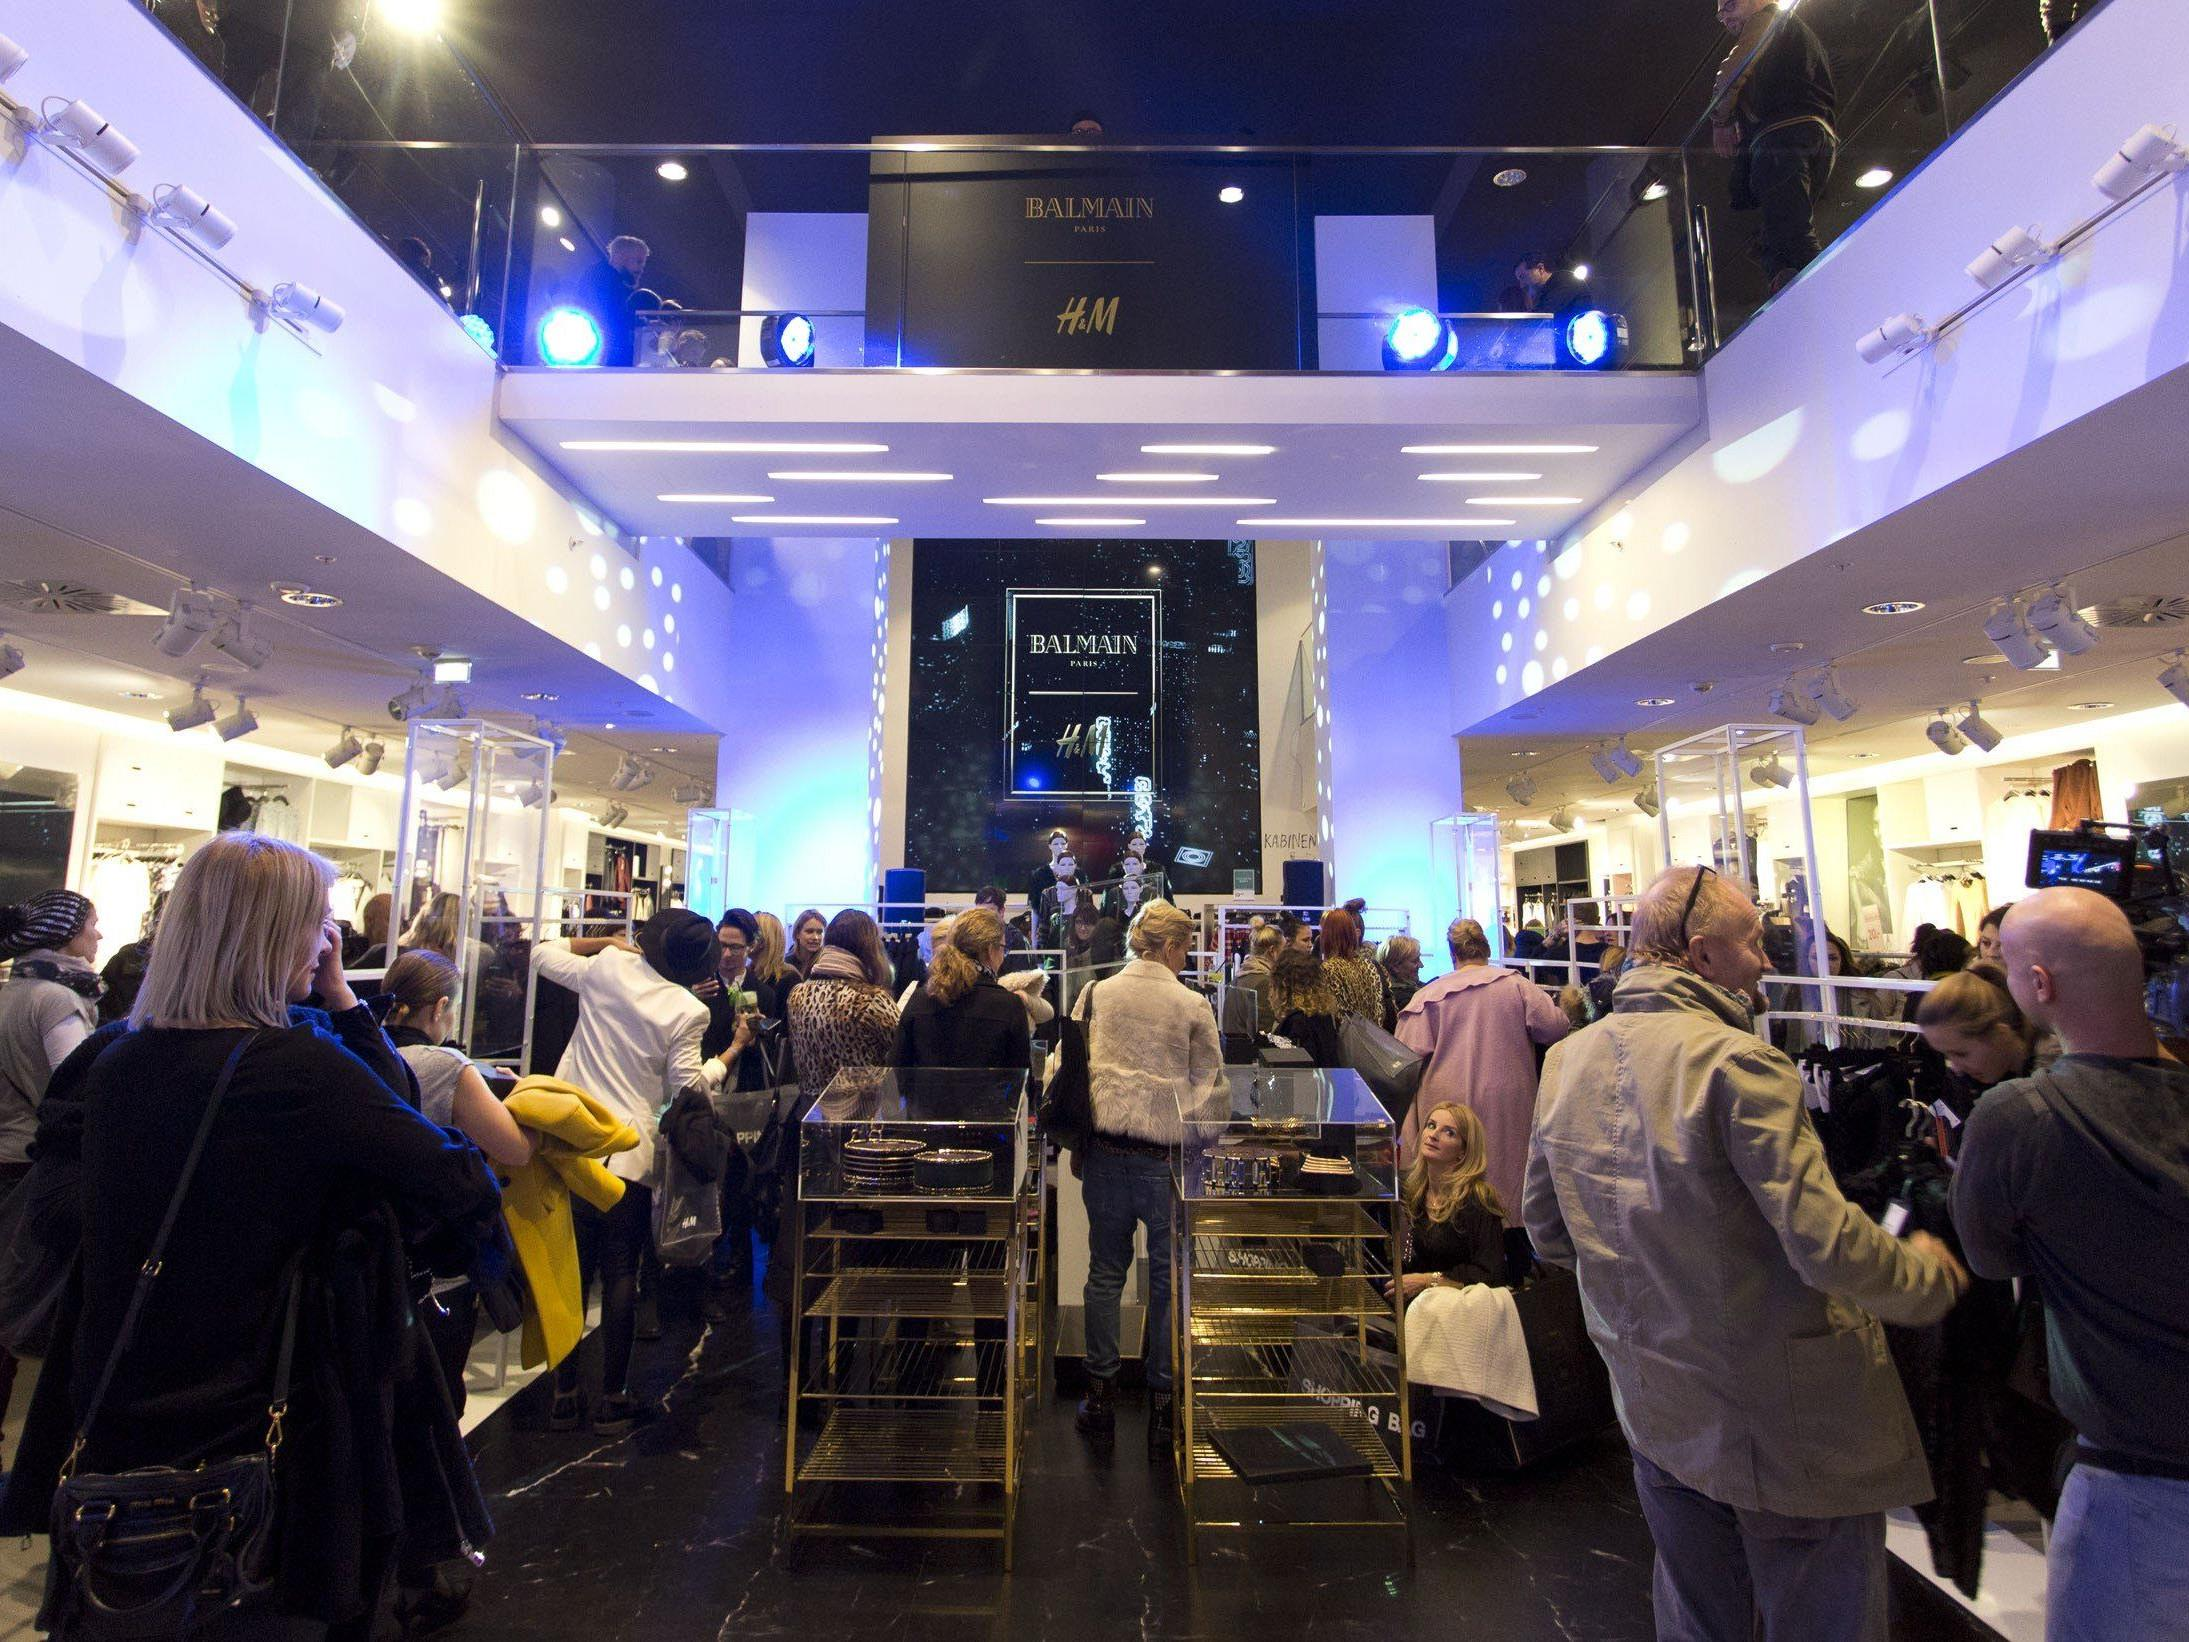 Balmain-Kollektion: Pre-Shopping im H&M Mariahilfer Straße.